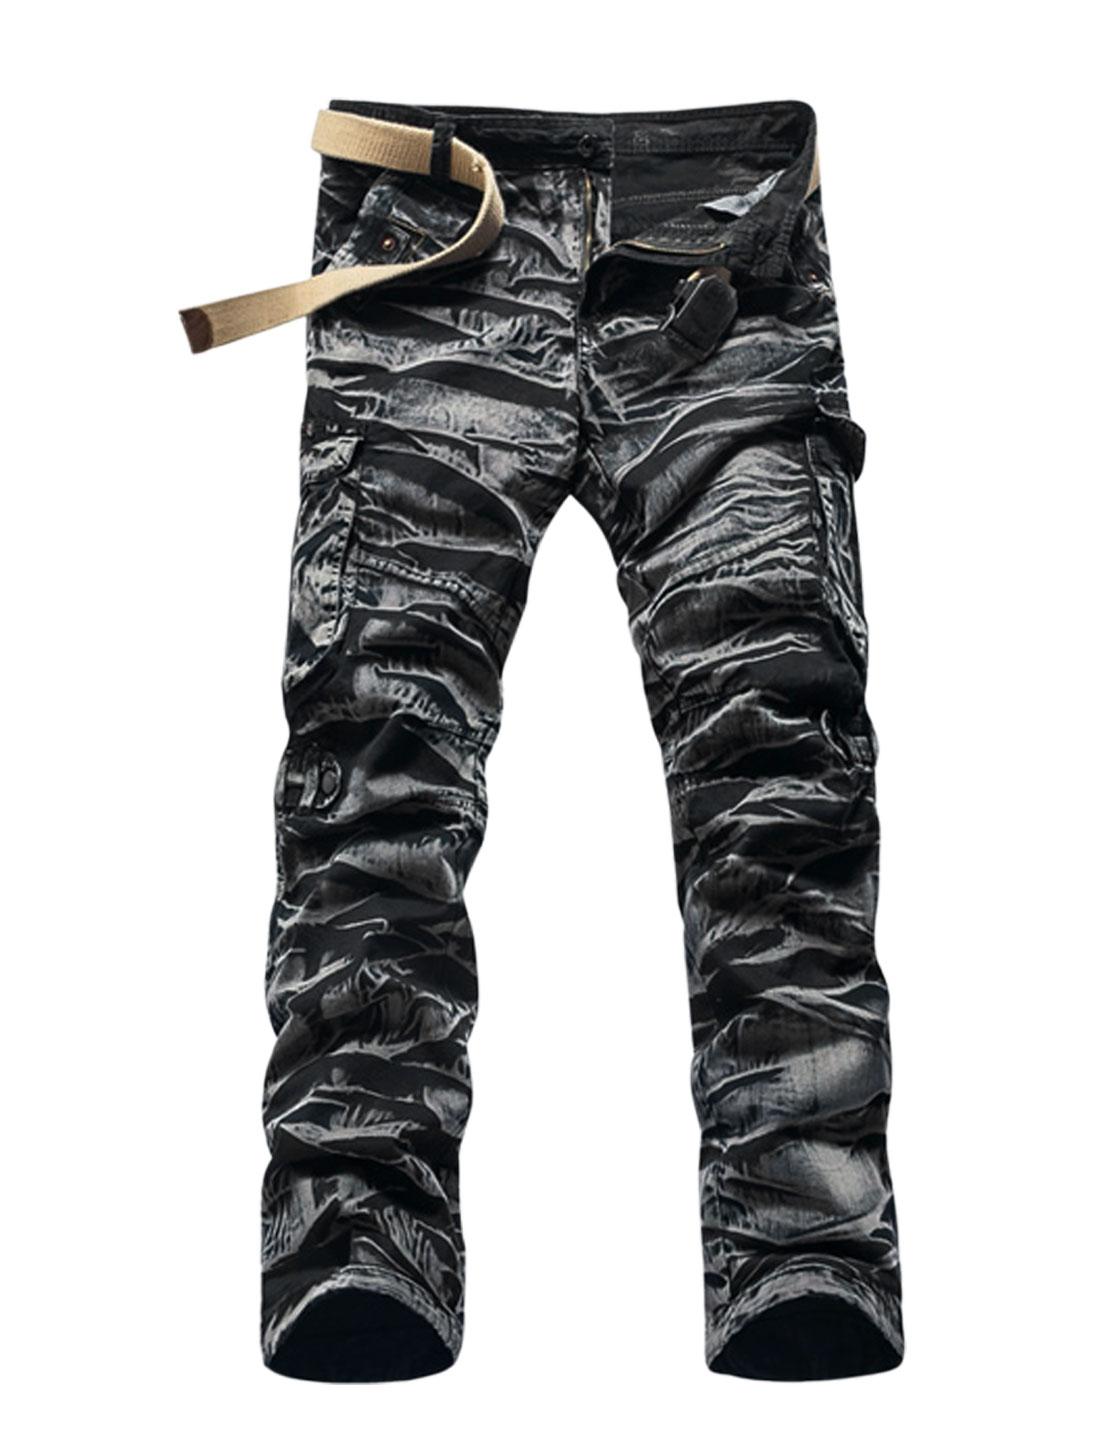 Men Tiger Stripes Military Cargo Pants Black White W34